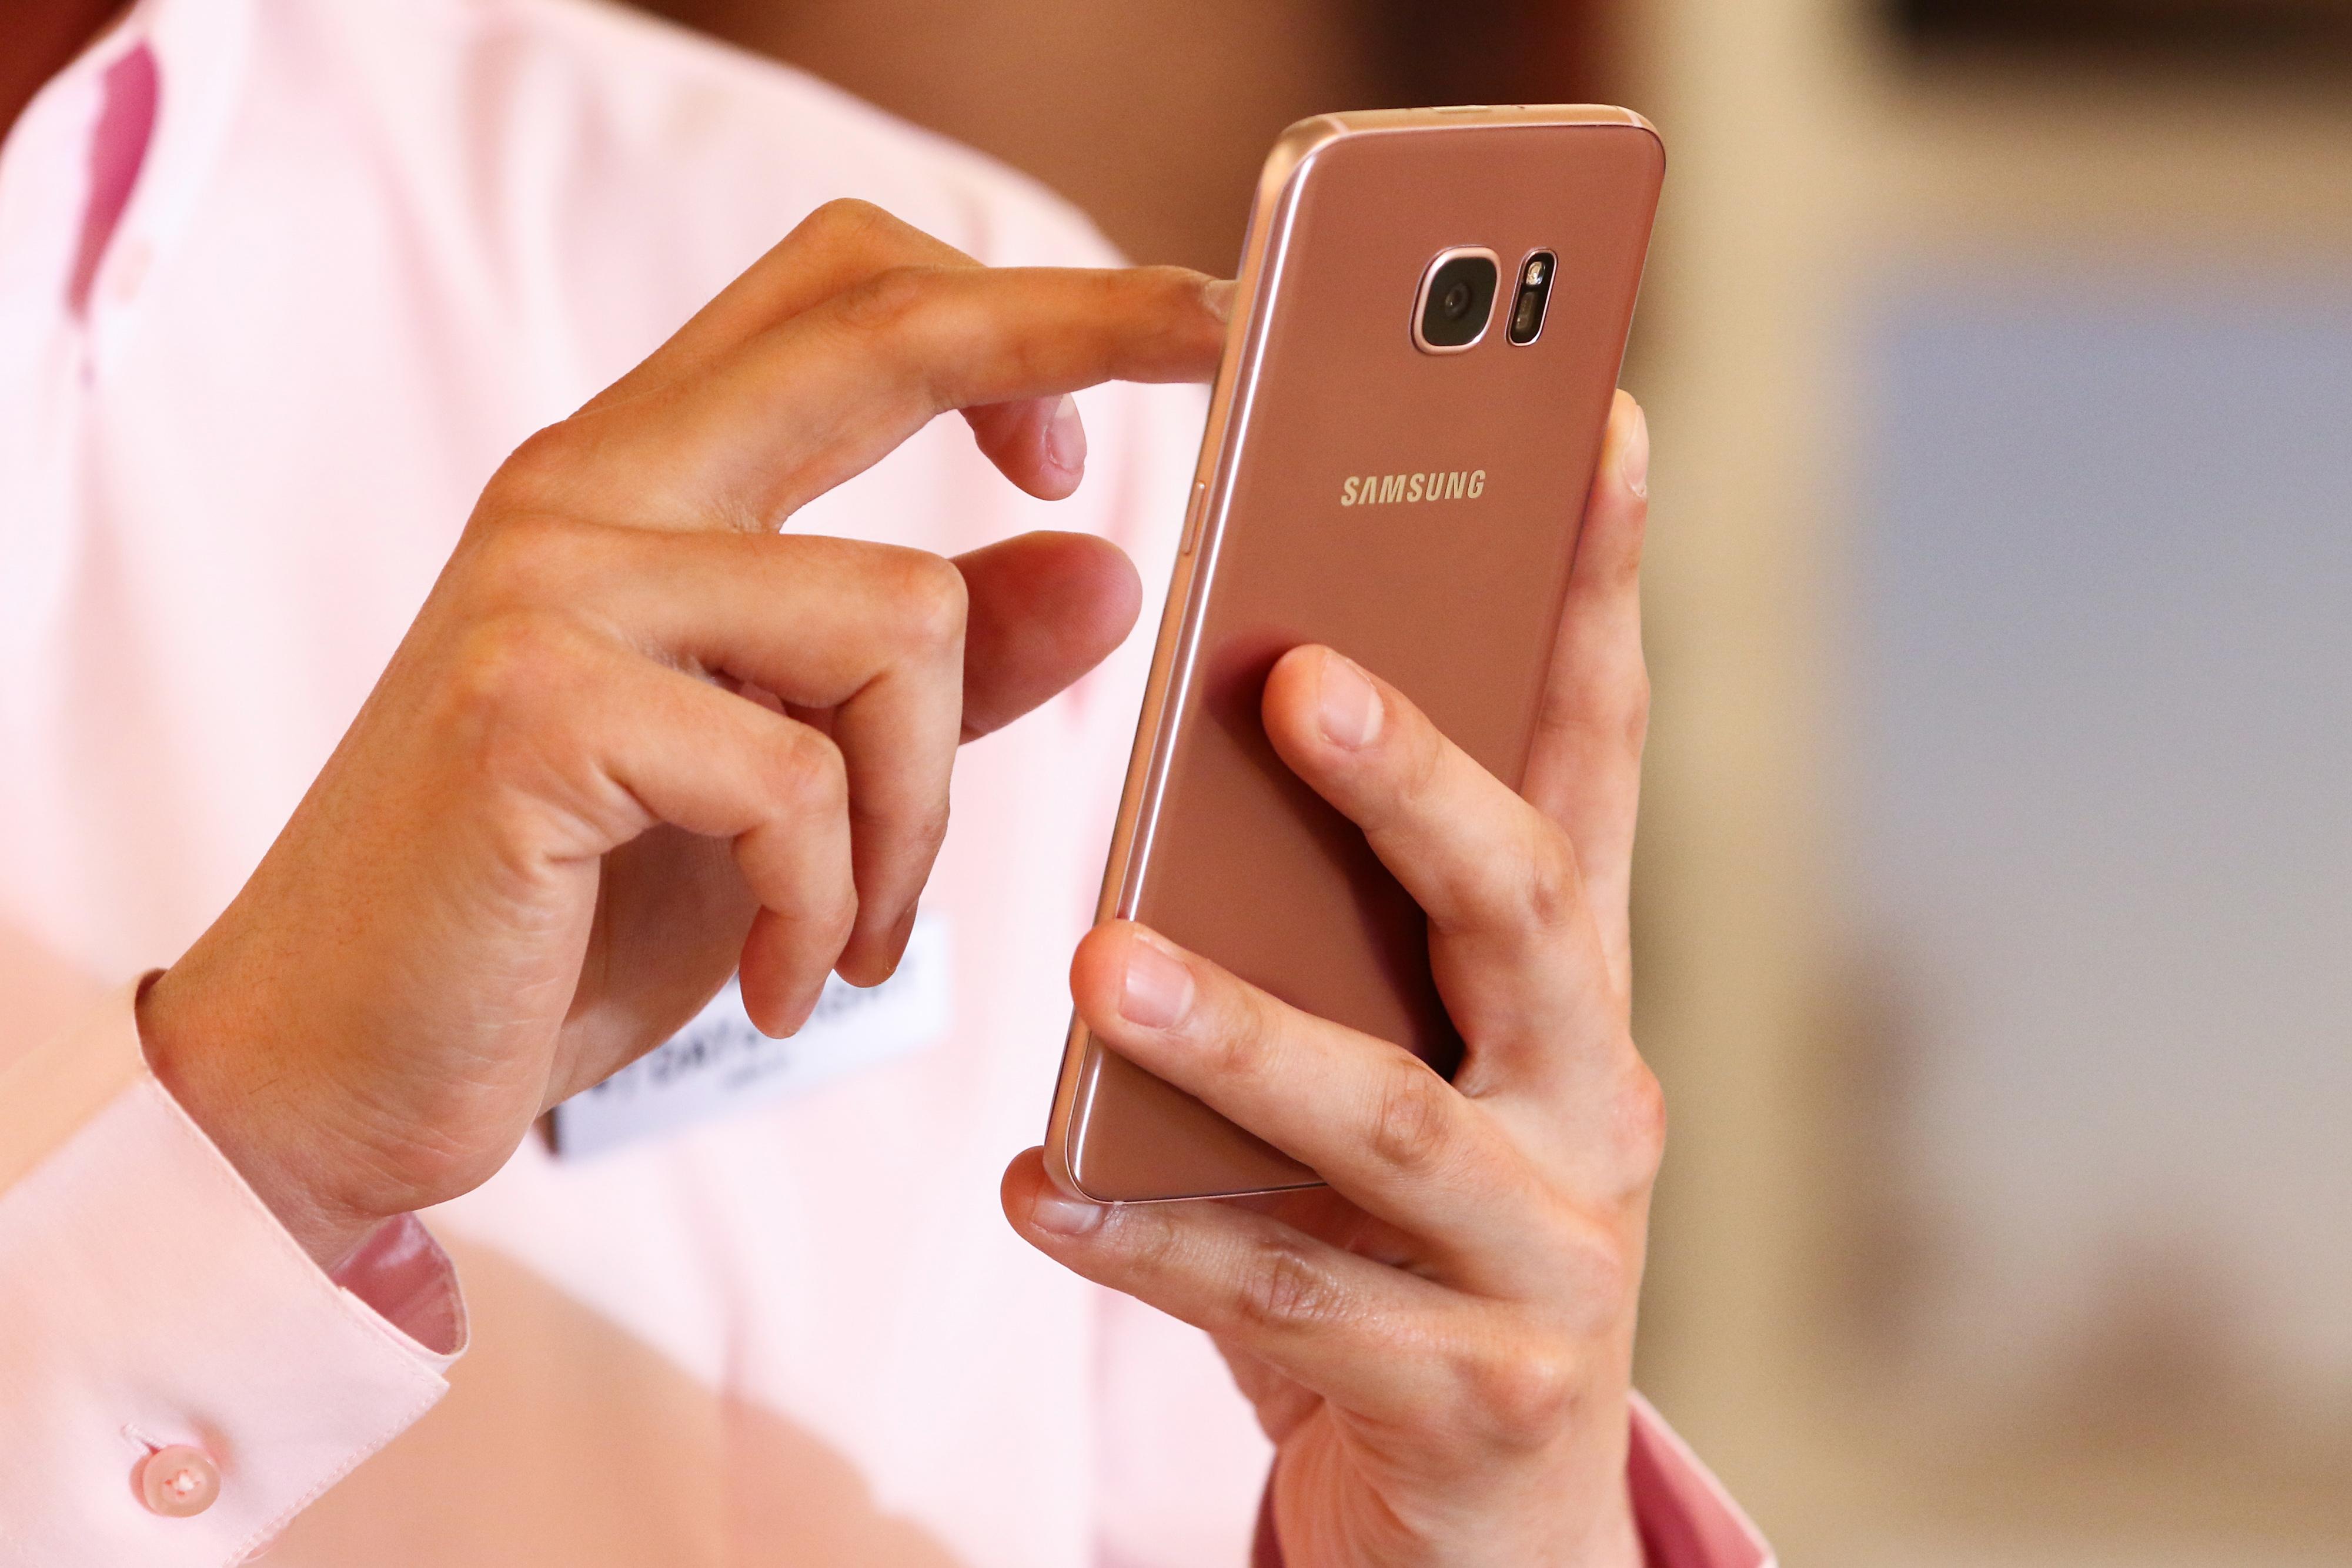 smartphone texting bloomberg